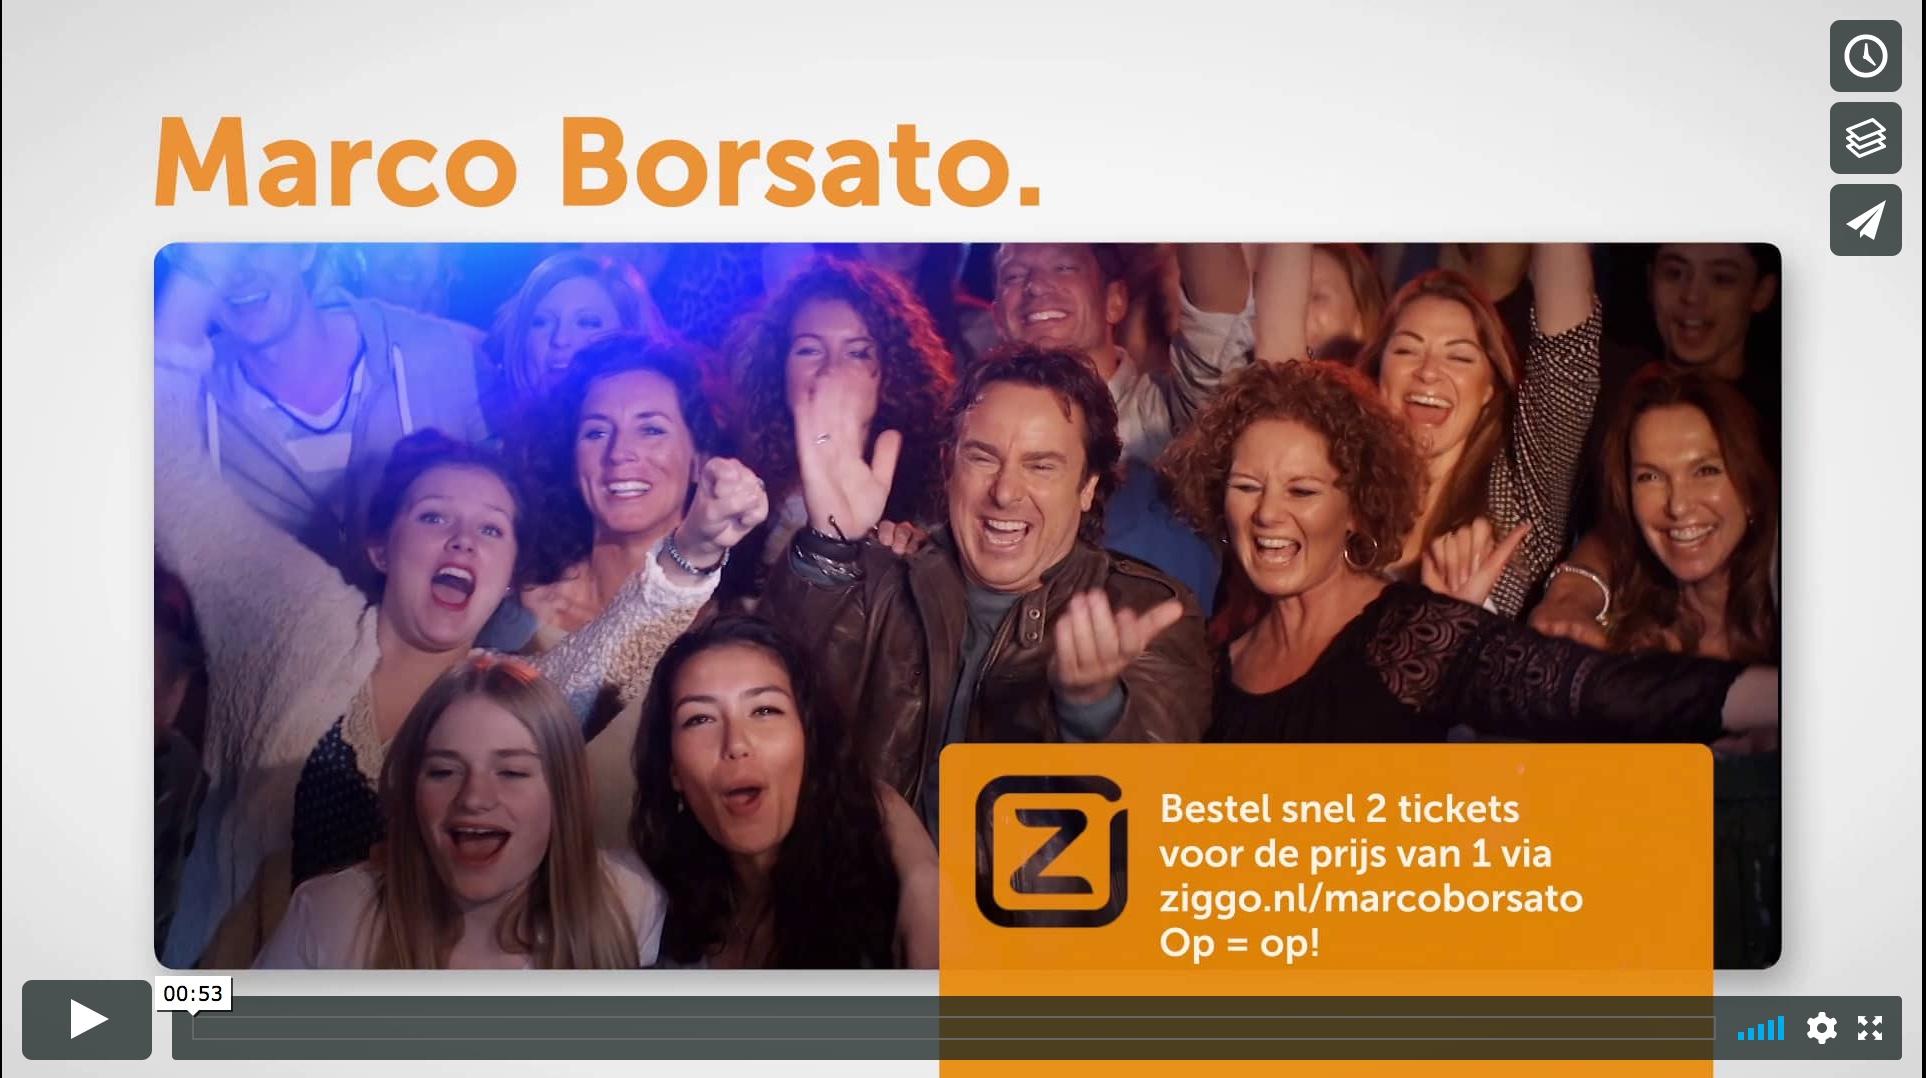 Marco Borsato Ziggo tour